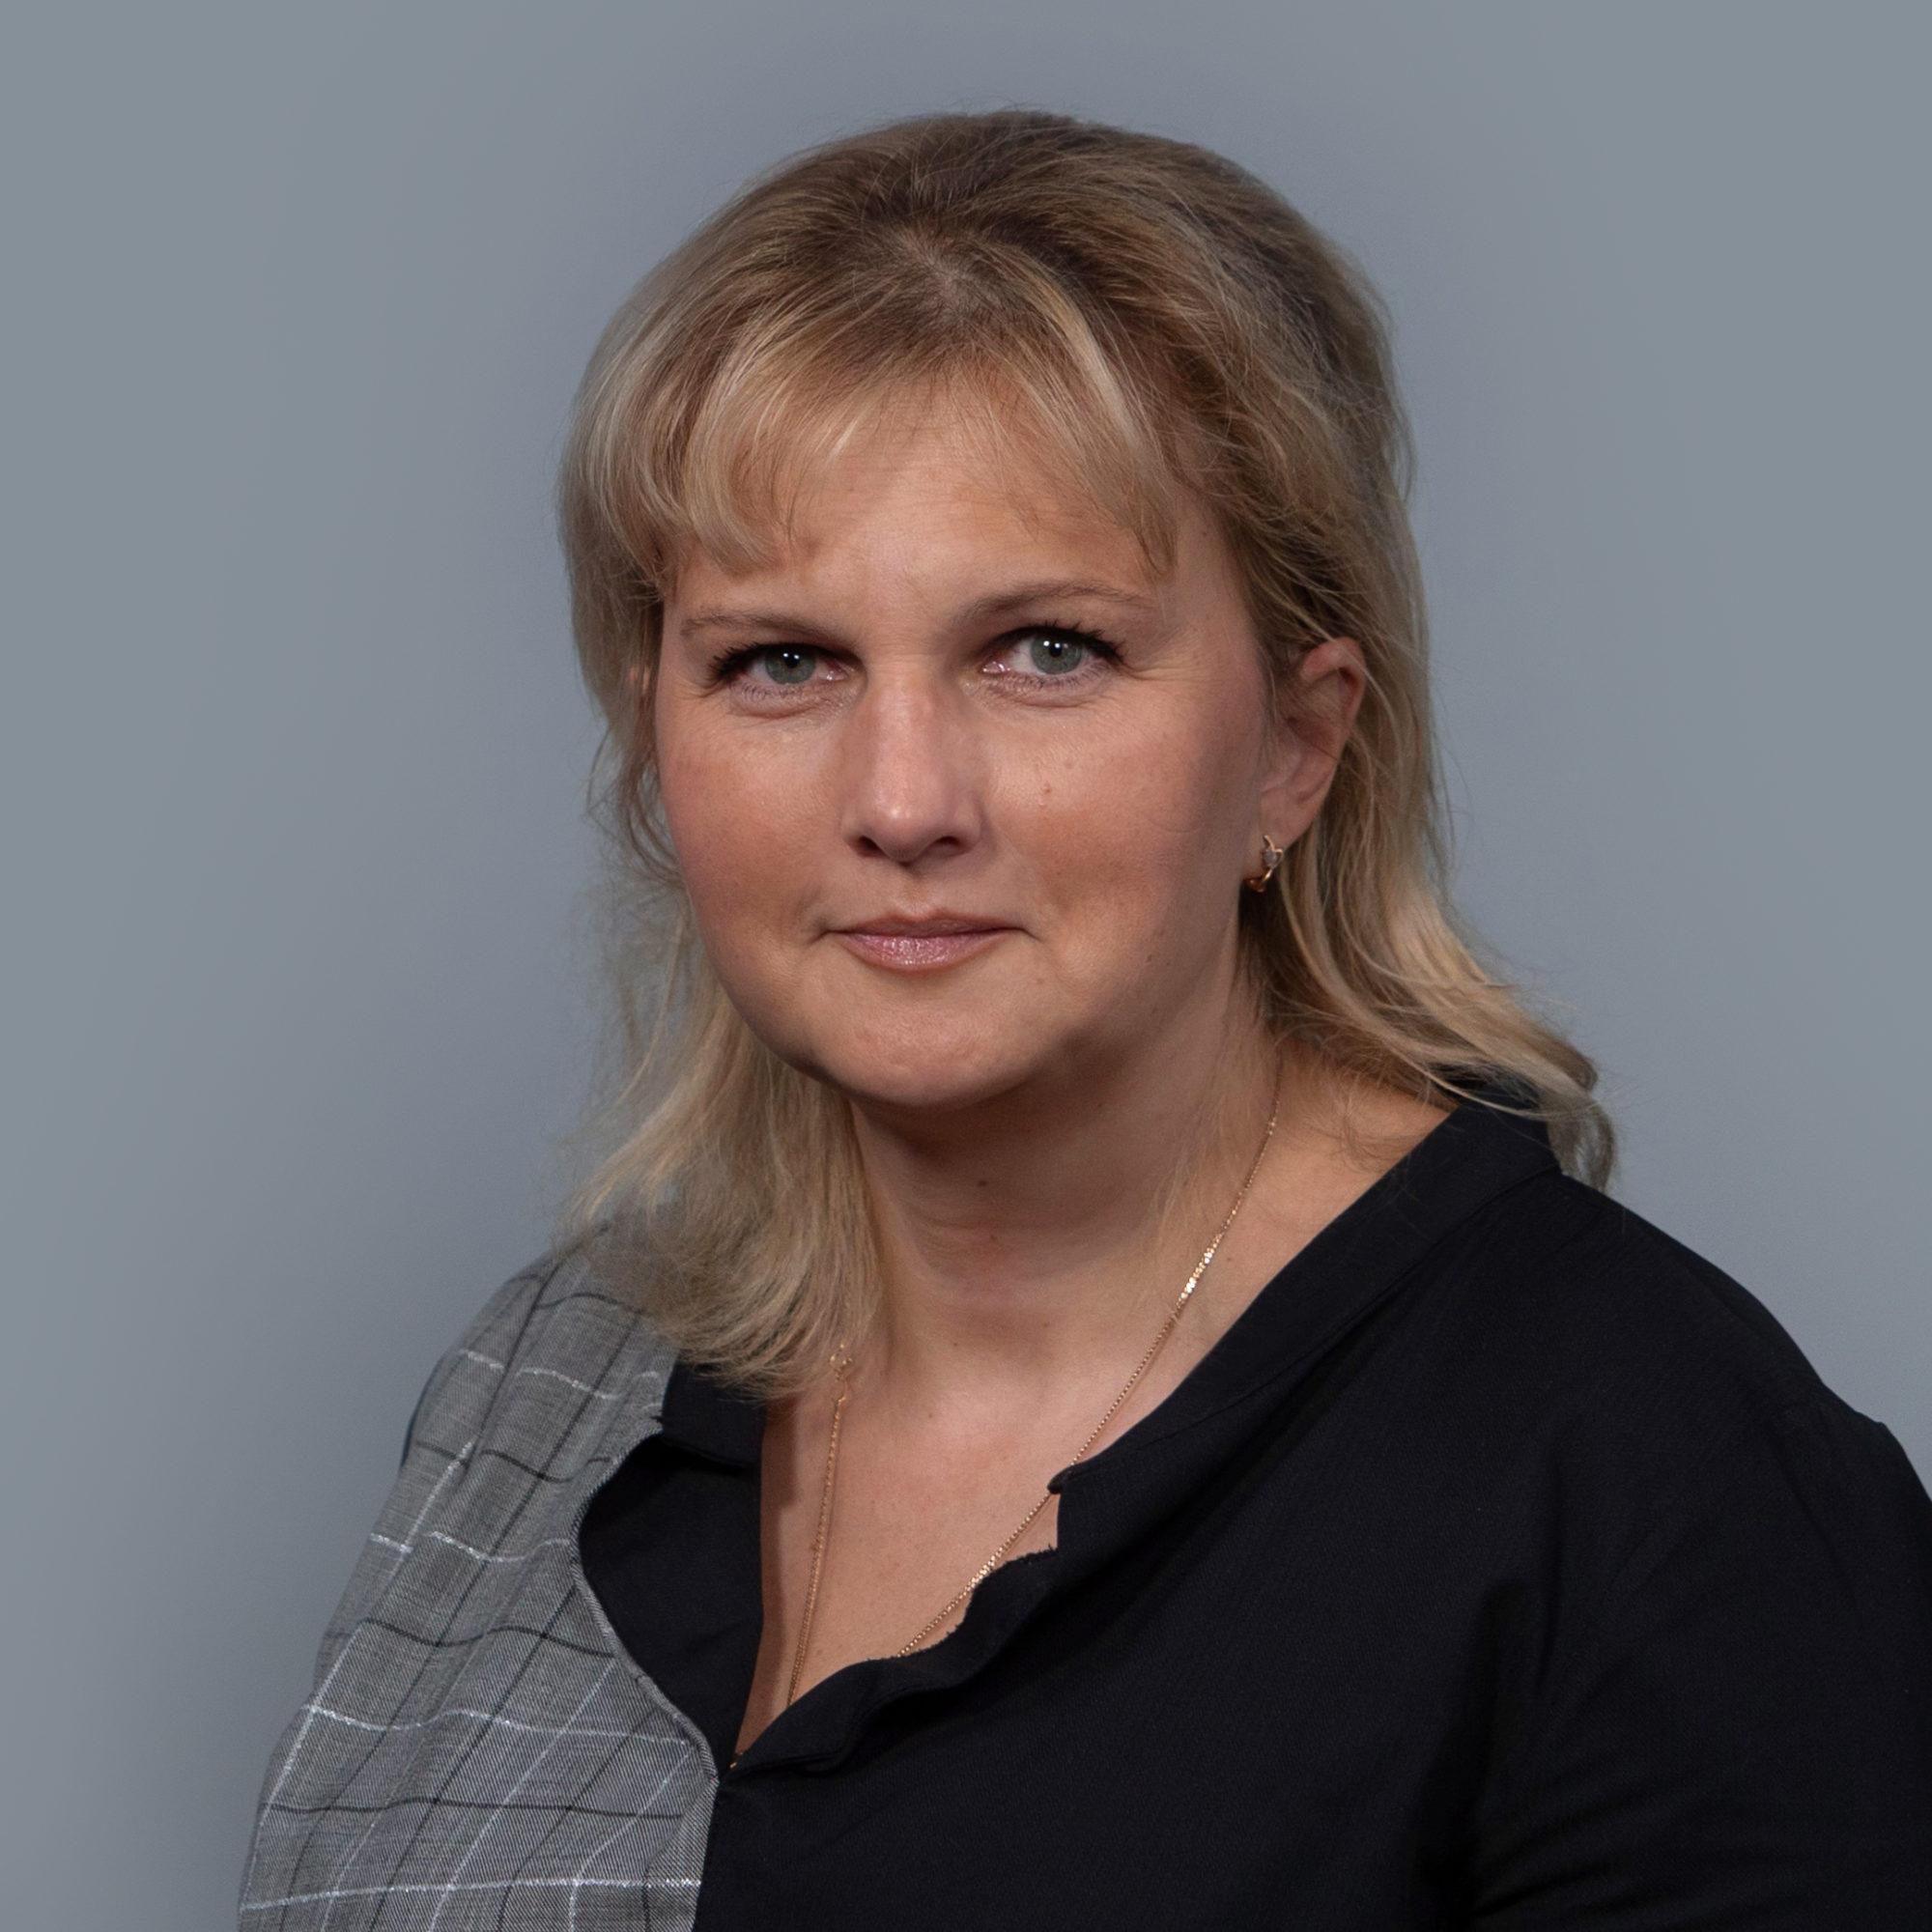 Svetlana Novoselova